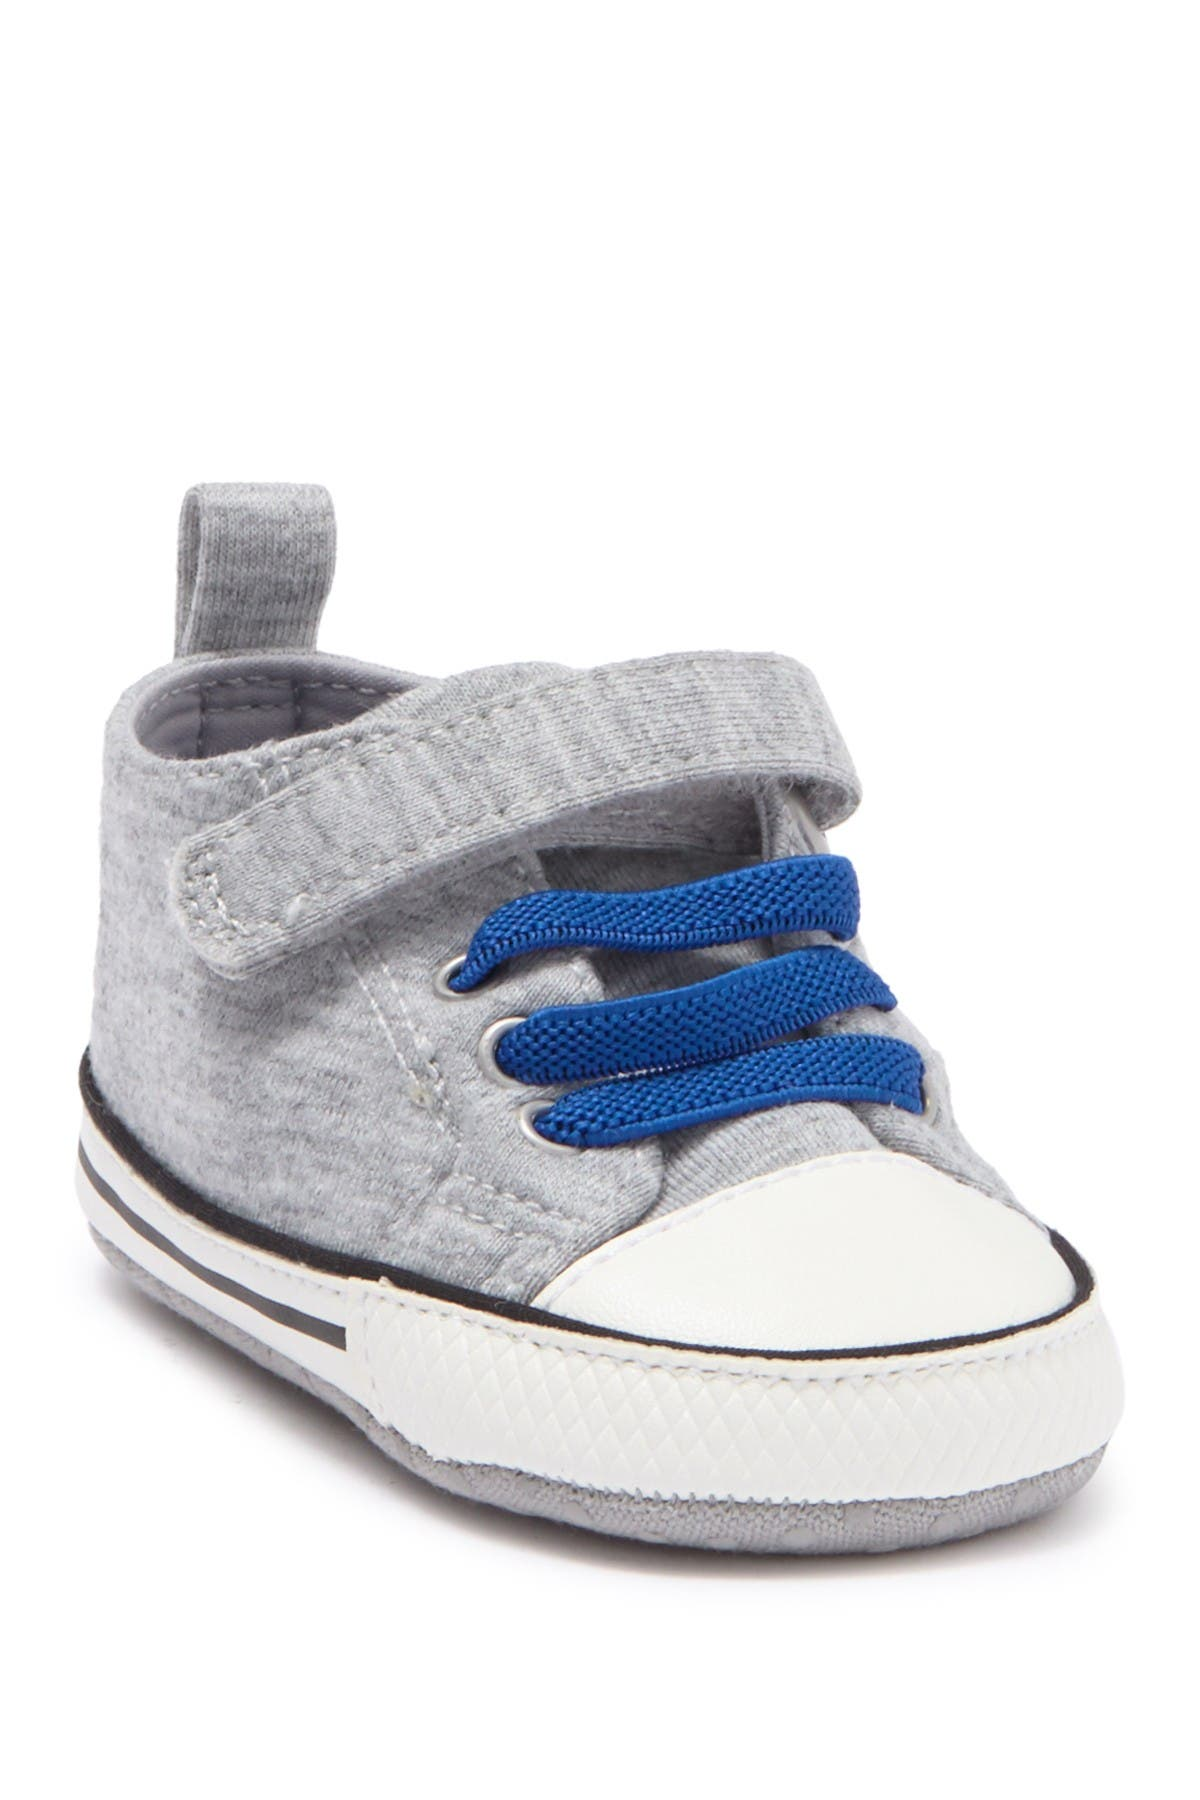 Image of Joe Fresh Neglectus Sneaker Crib Shoe